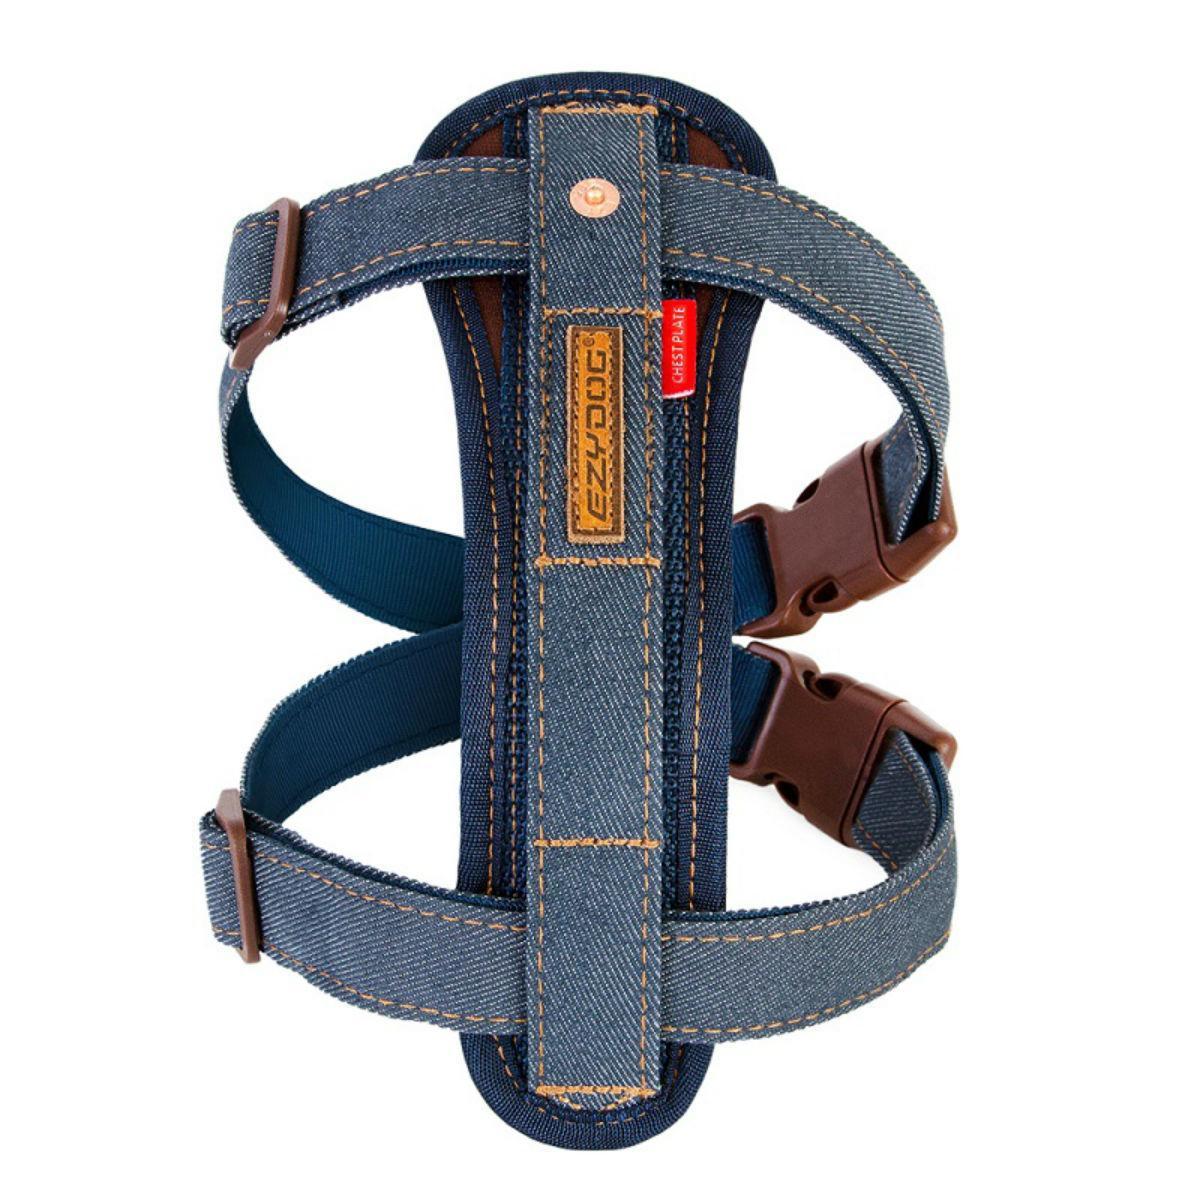 EzyDog Chest Plate Dog Harness - Denim